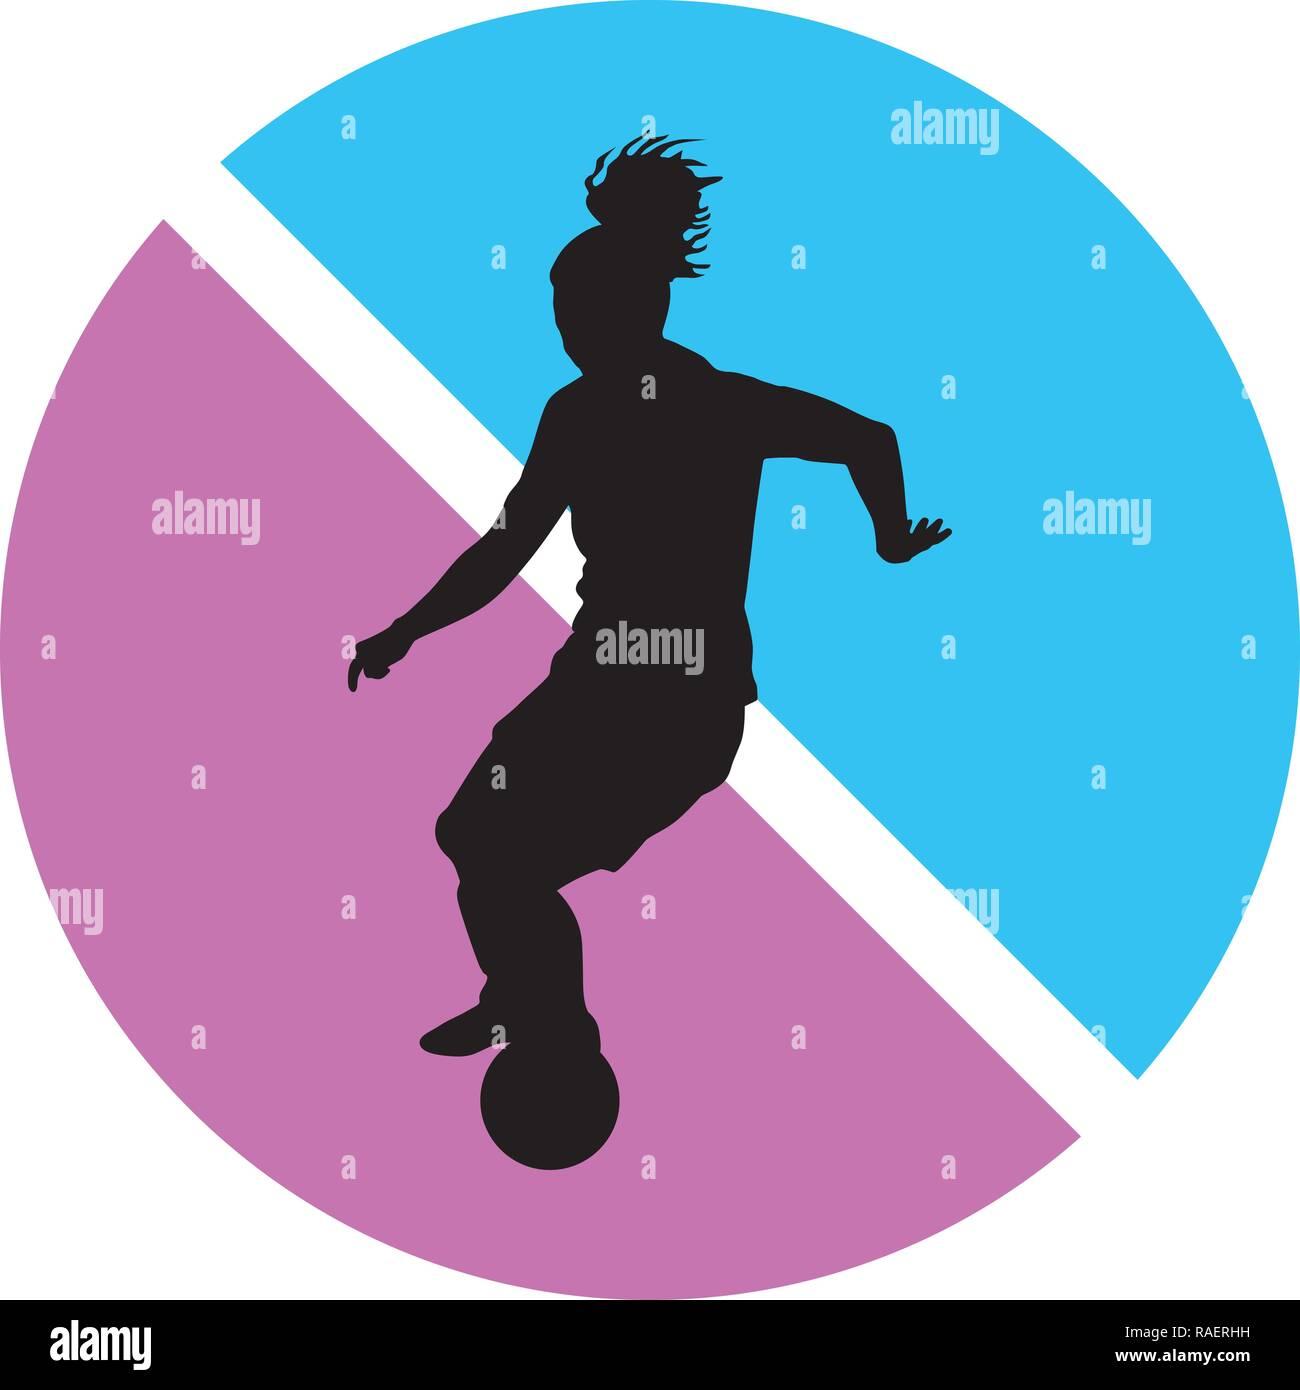 girl soccer player silhouette - Stock Image